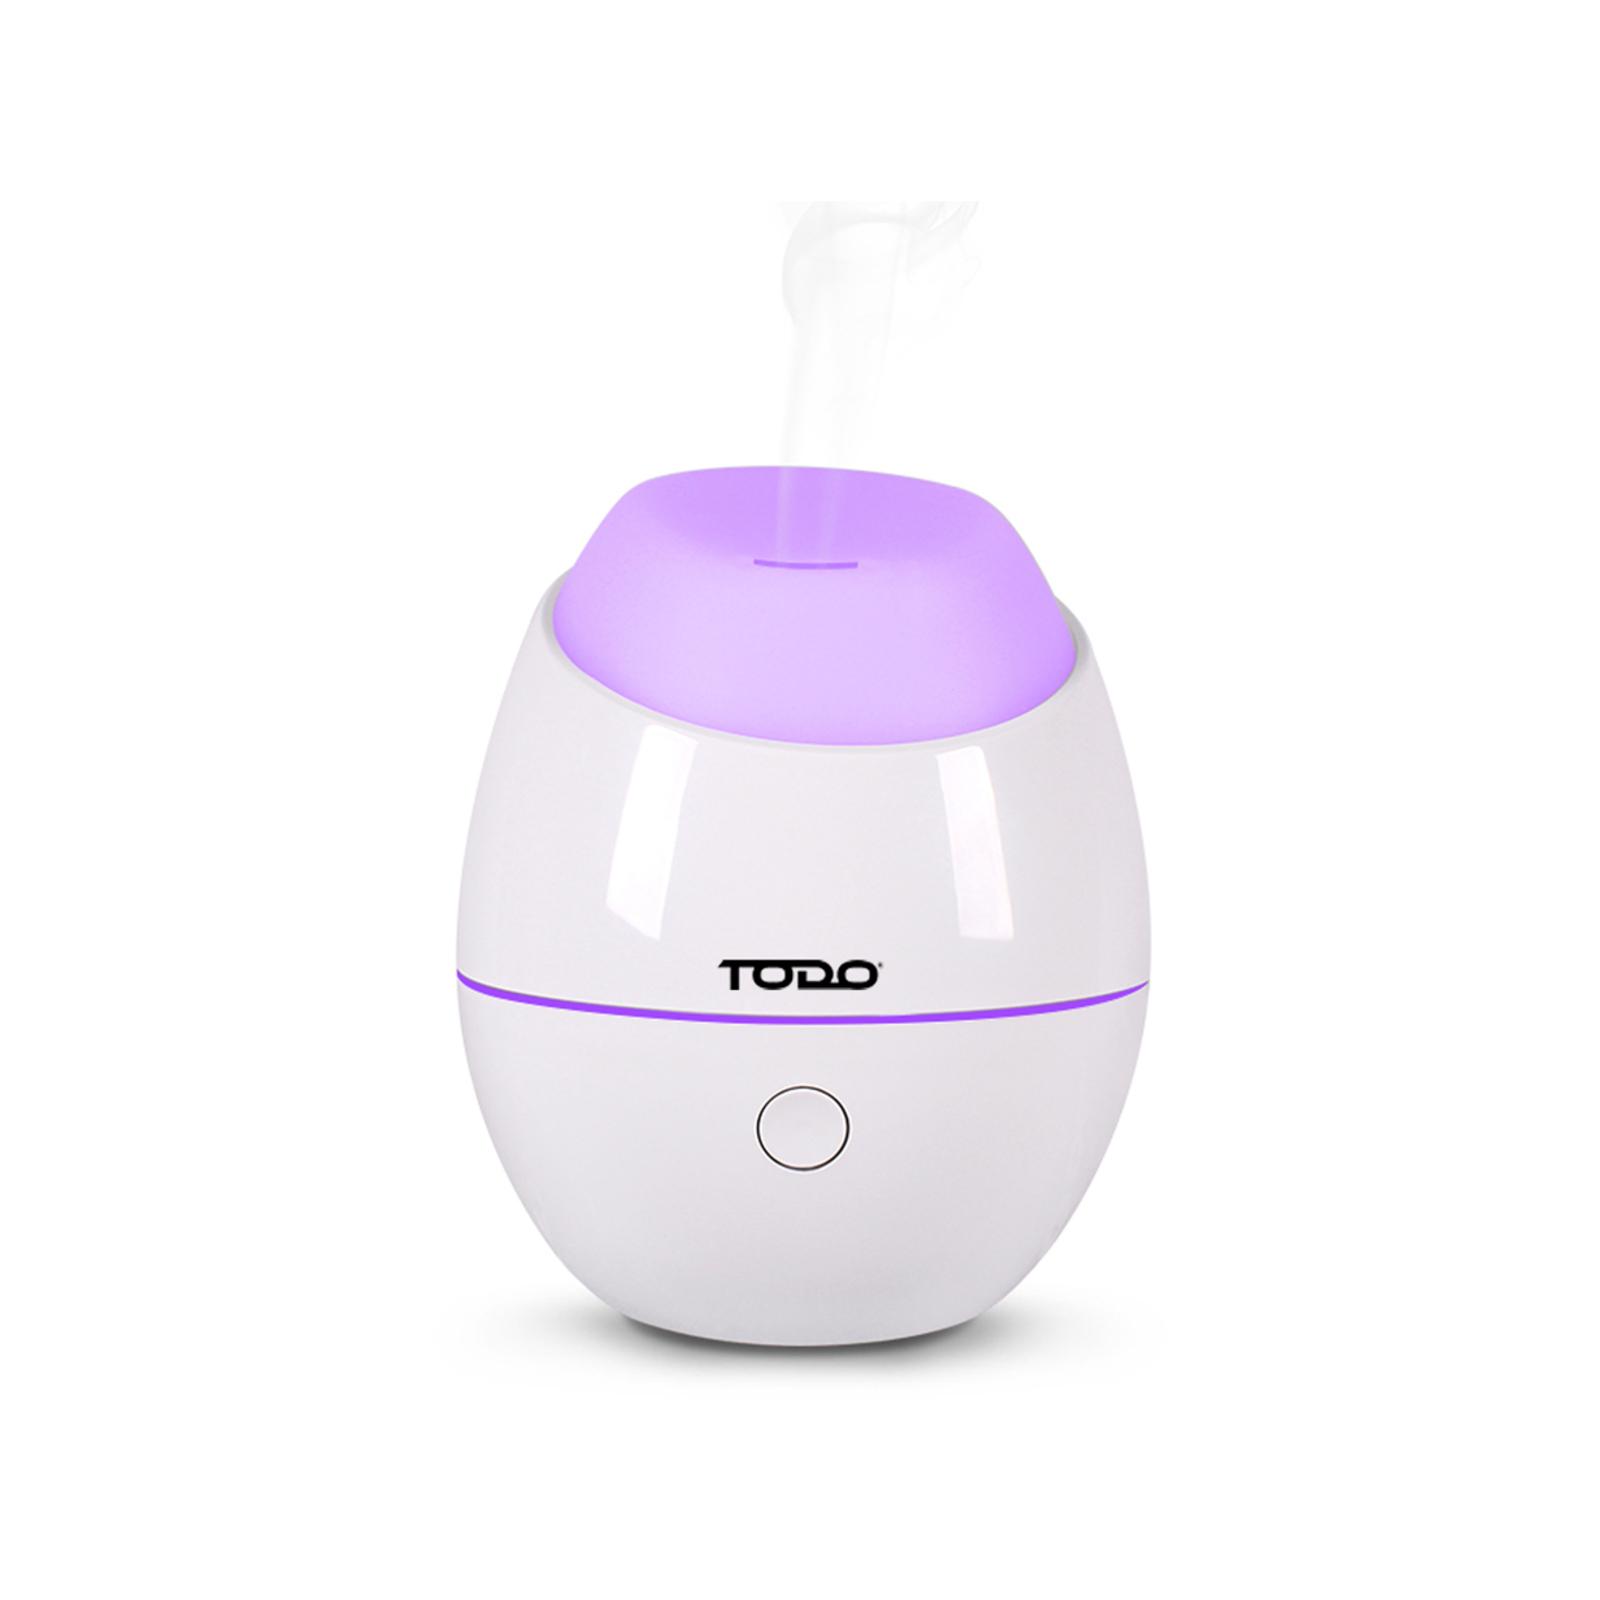 TODO 120ml Humidifier Aromatherapy Diffuser w/ LED Light - White